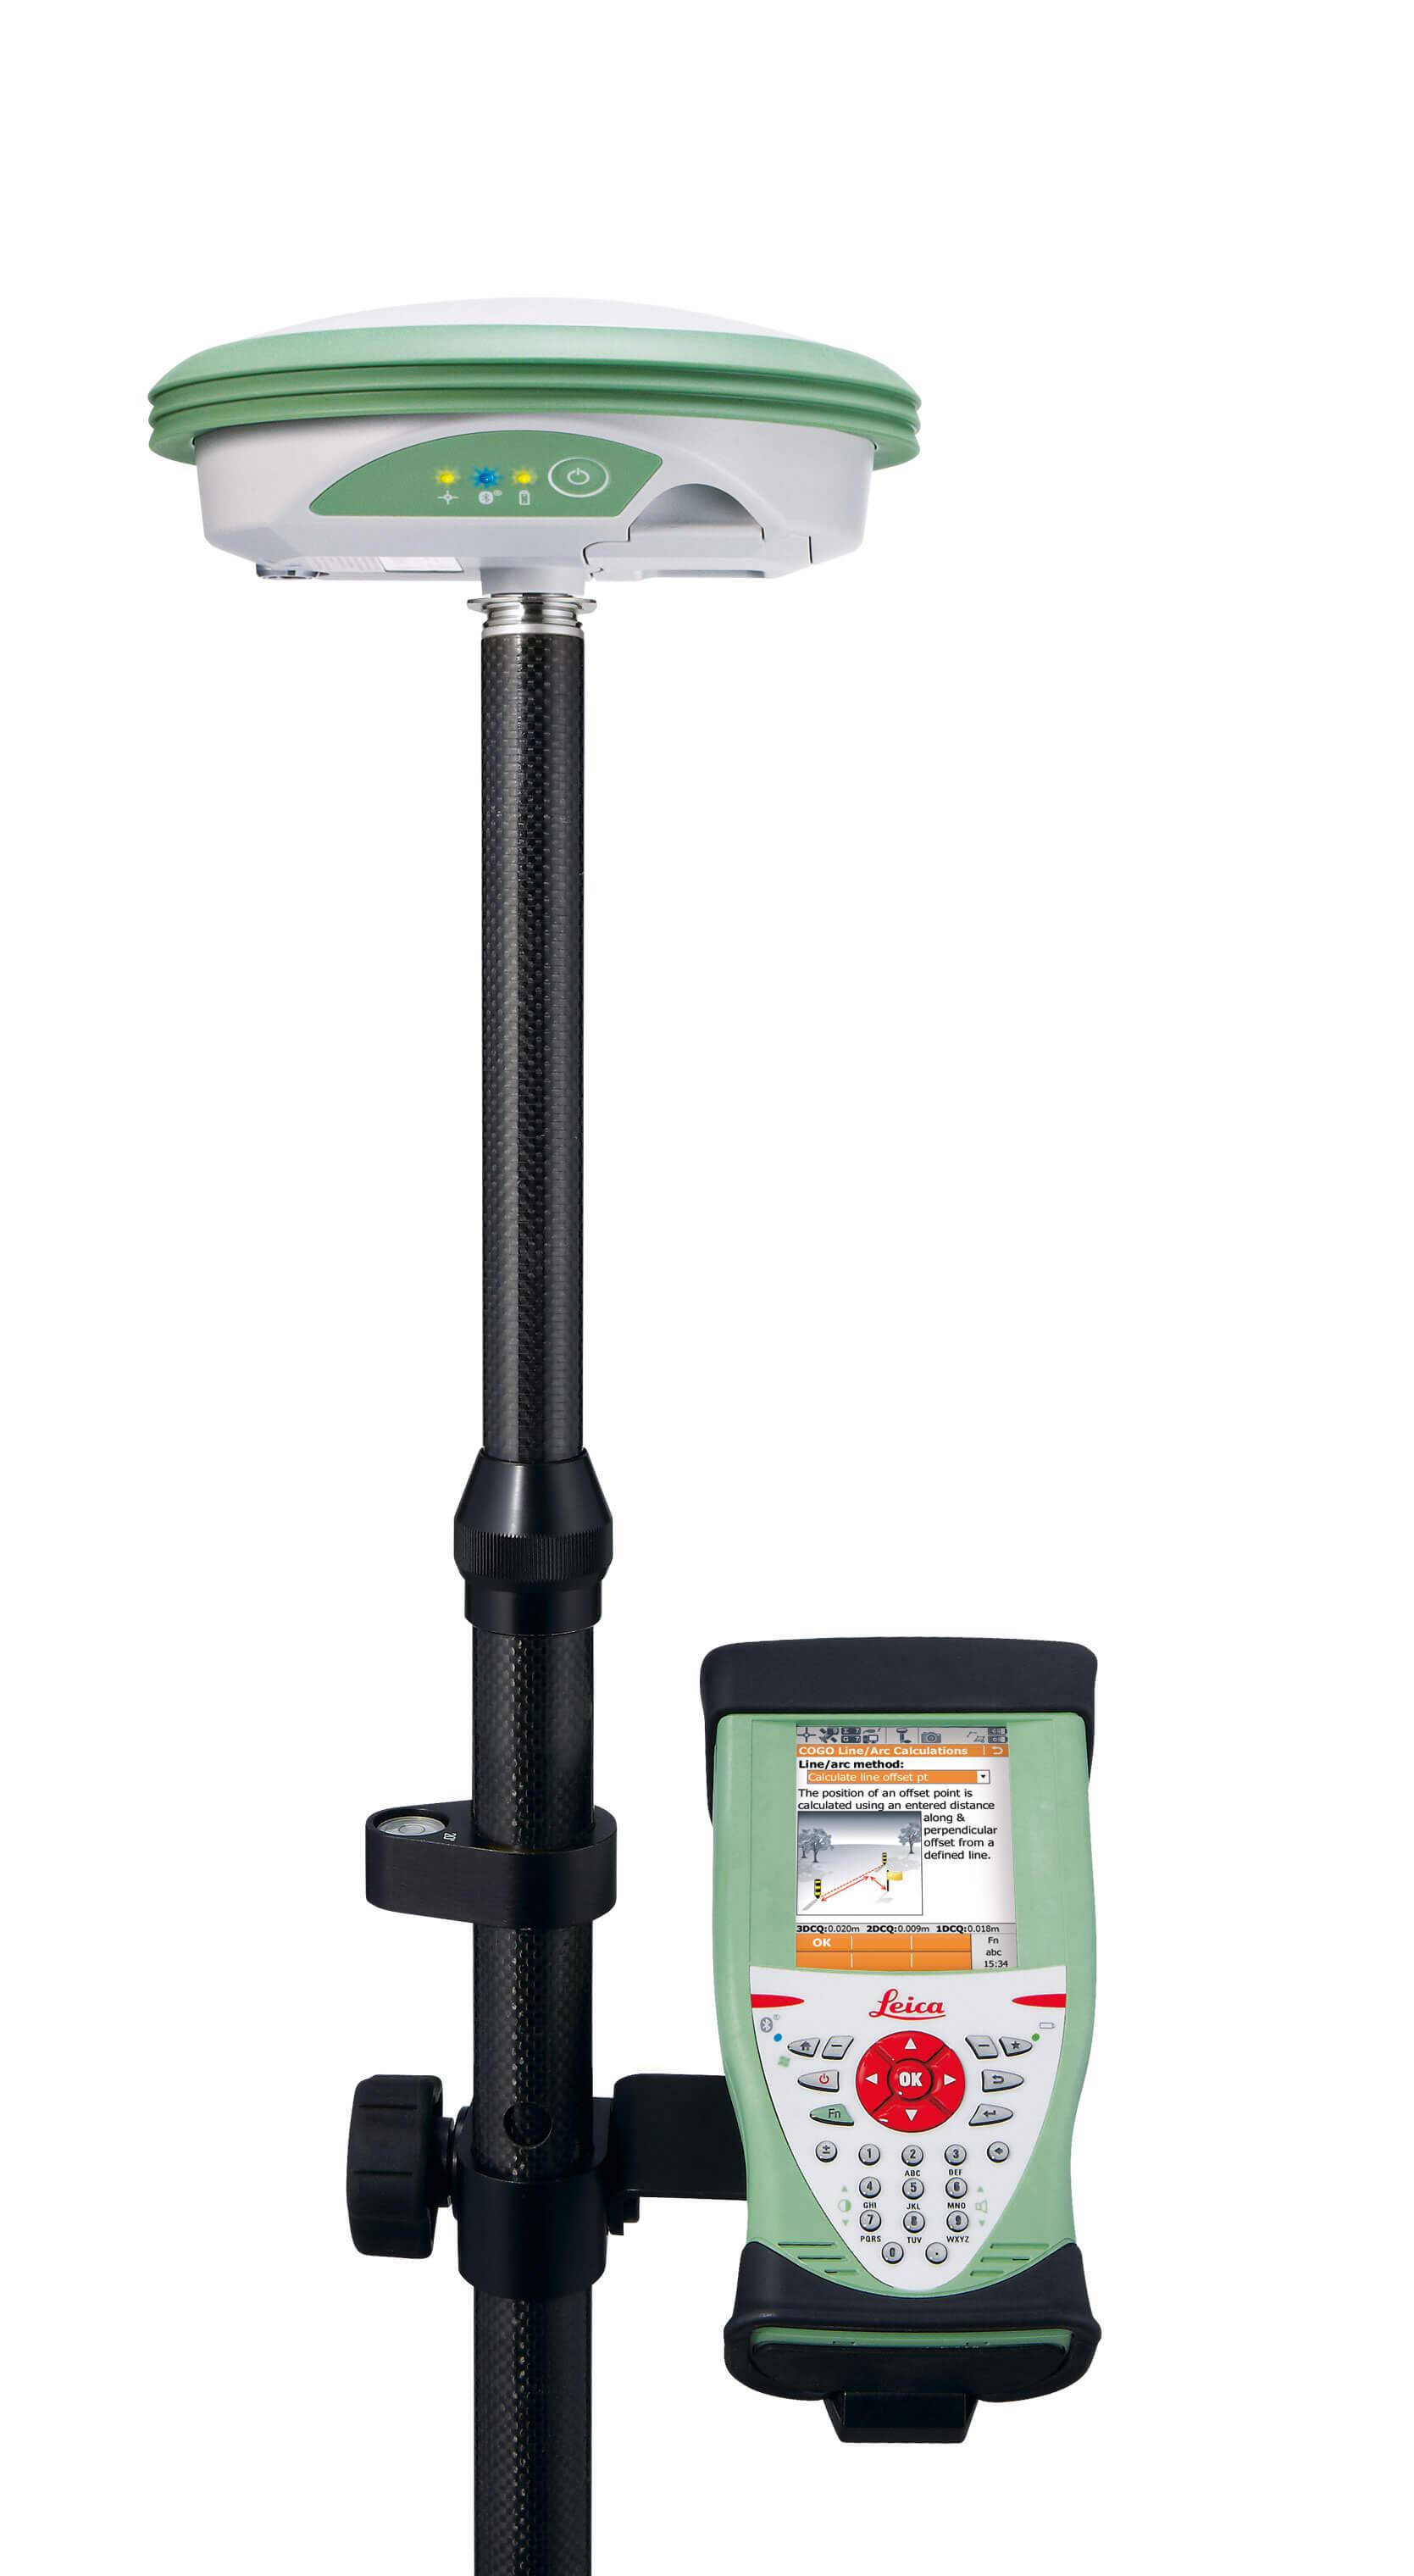 GNSS приемник Leica (Швейцария) GS08+